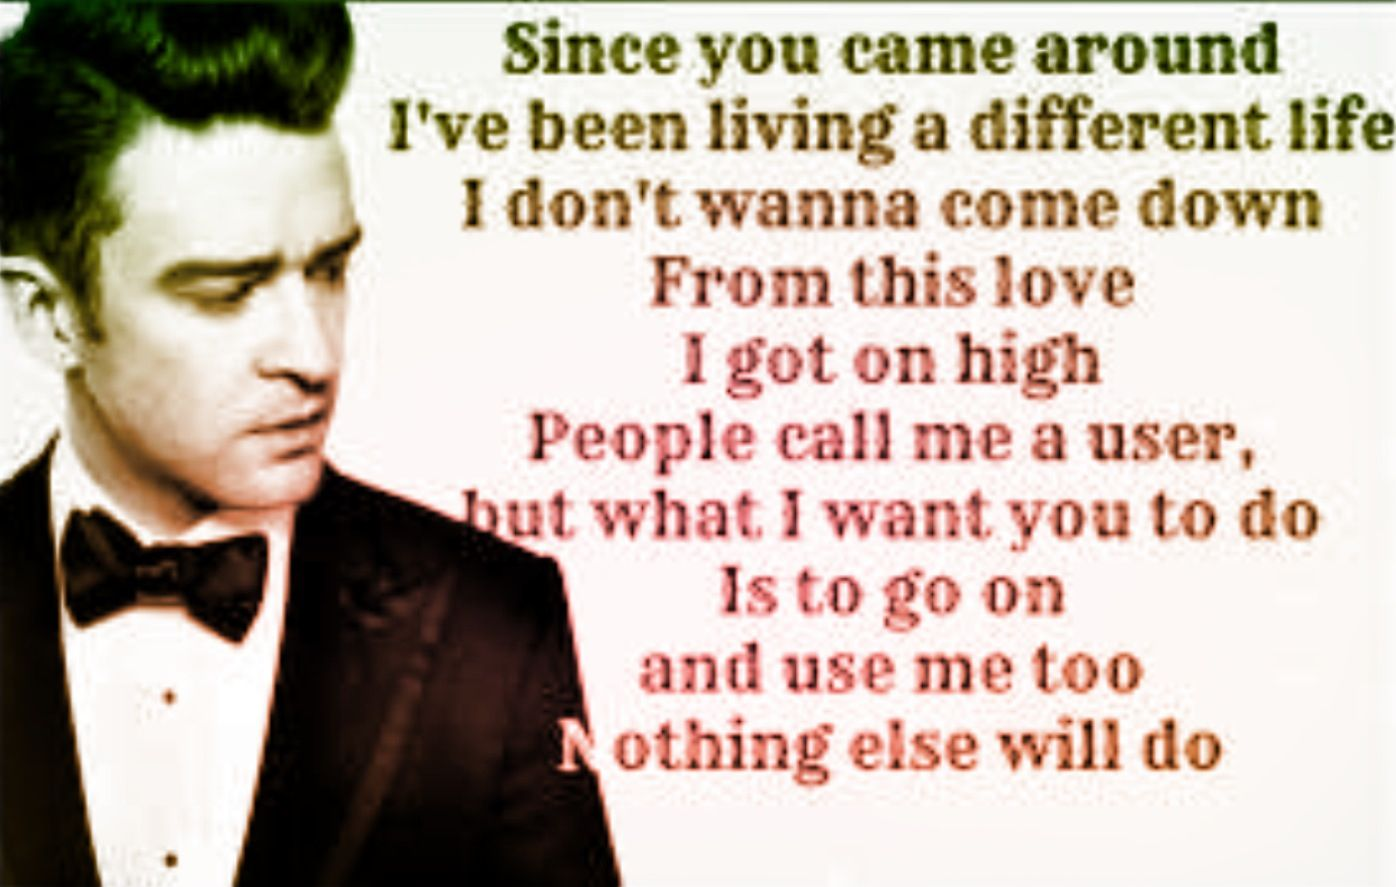 Justin Timberlake quote Singer quote, Justin love